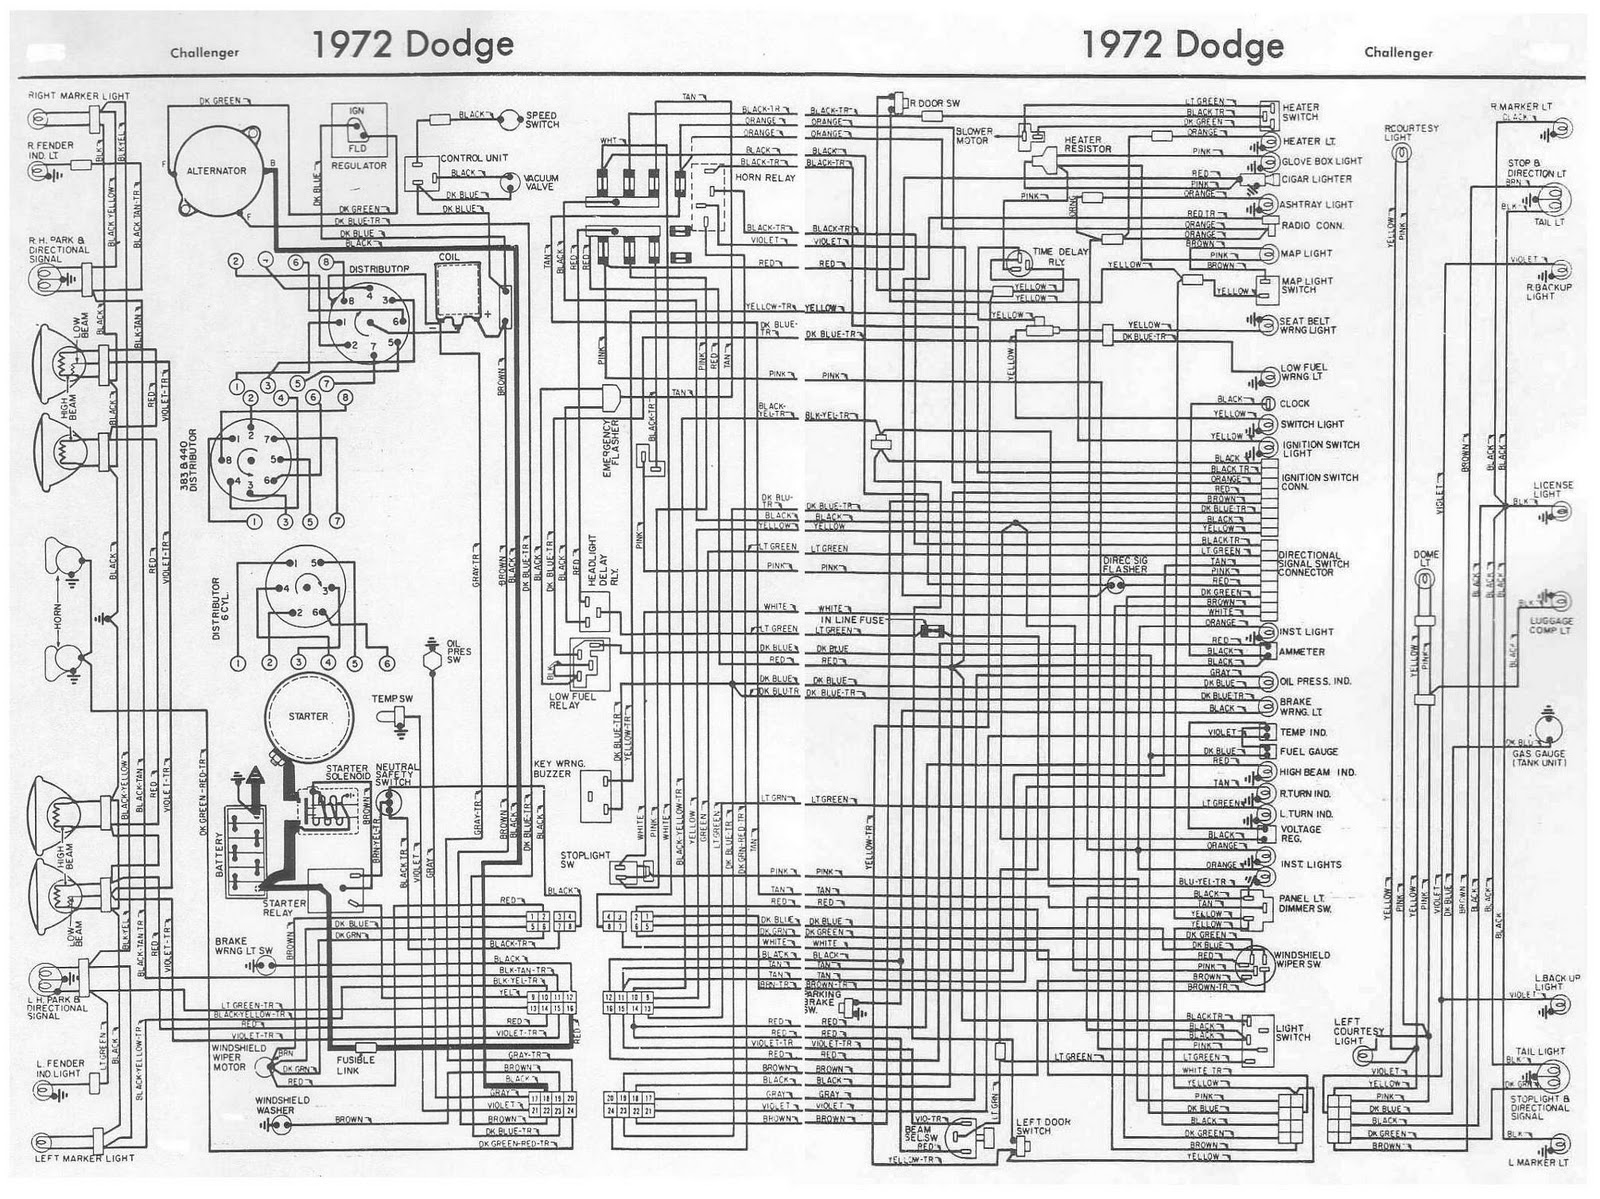 1970 dodge challenger rallye dash color wiring diagram